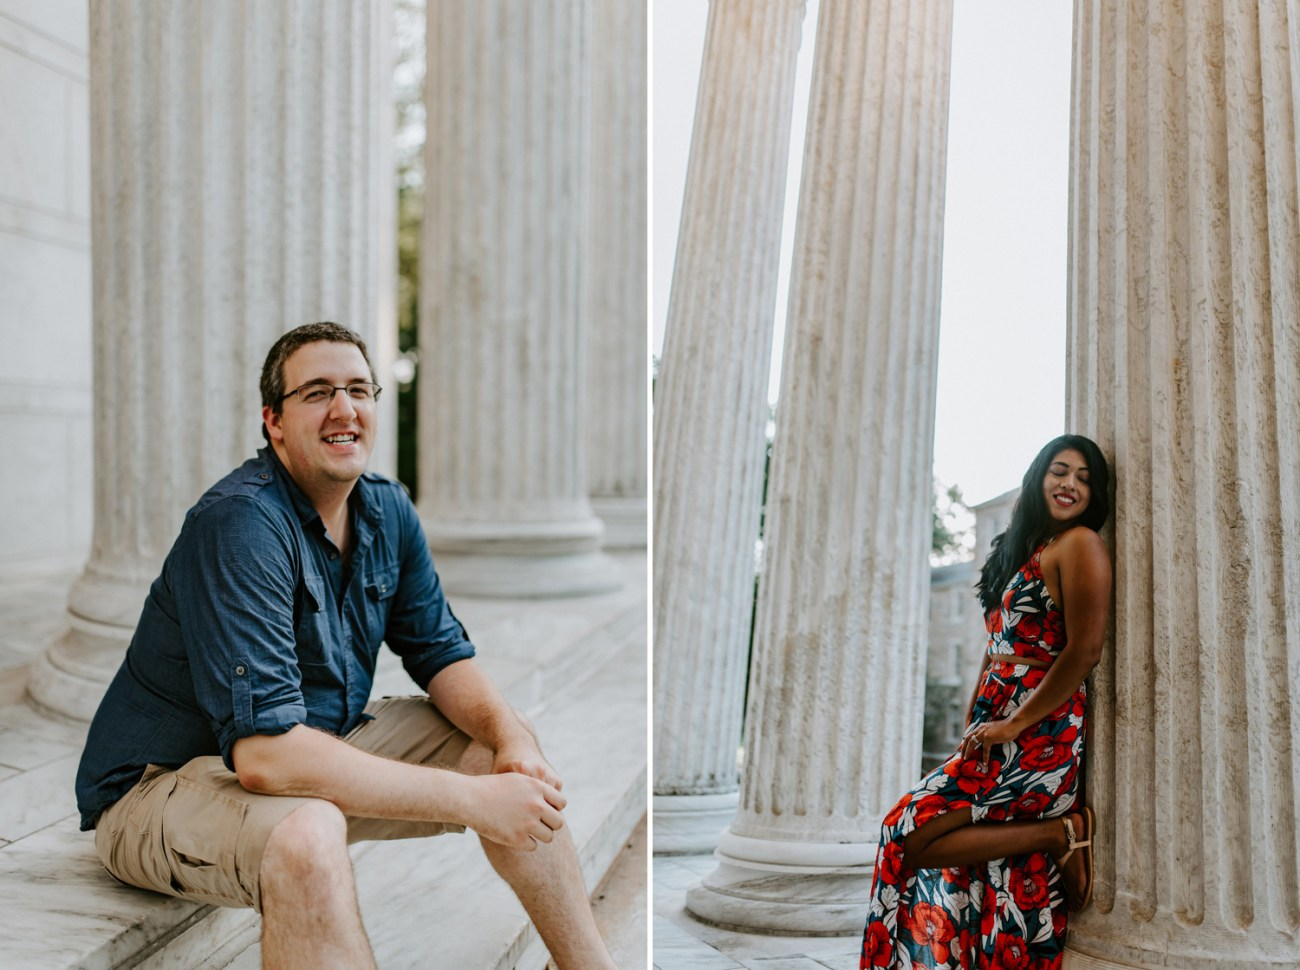 Princeton University Engagement Session Photos, New Jersey Wedding Photographer, Anais Possamai Photography